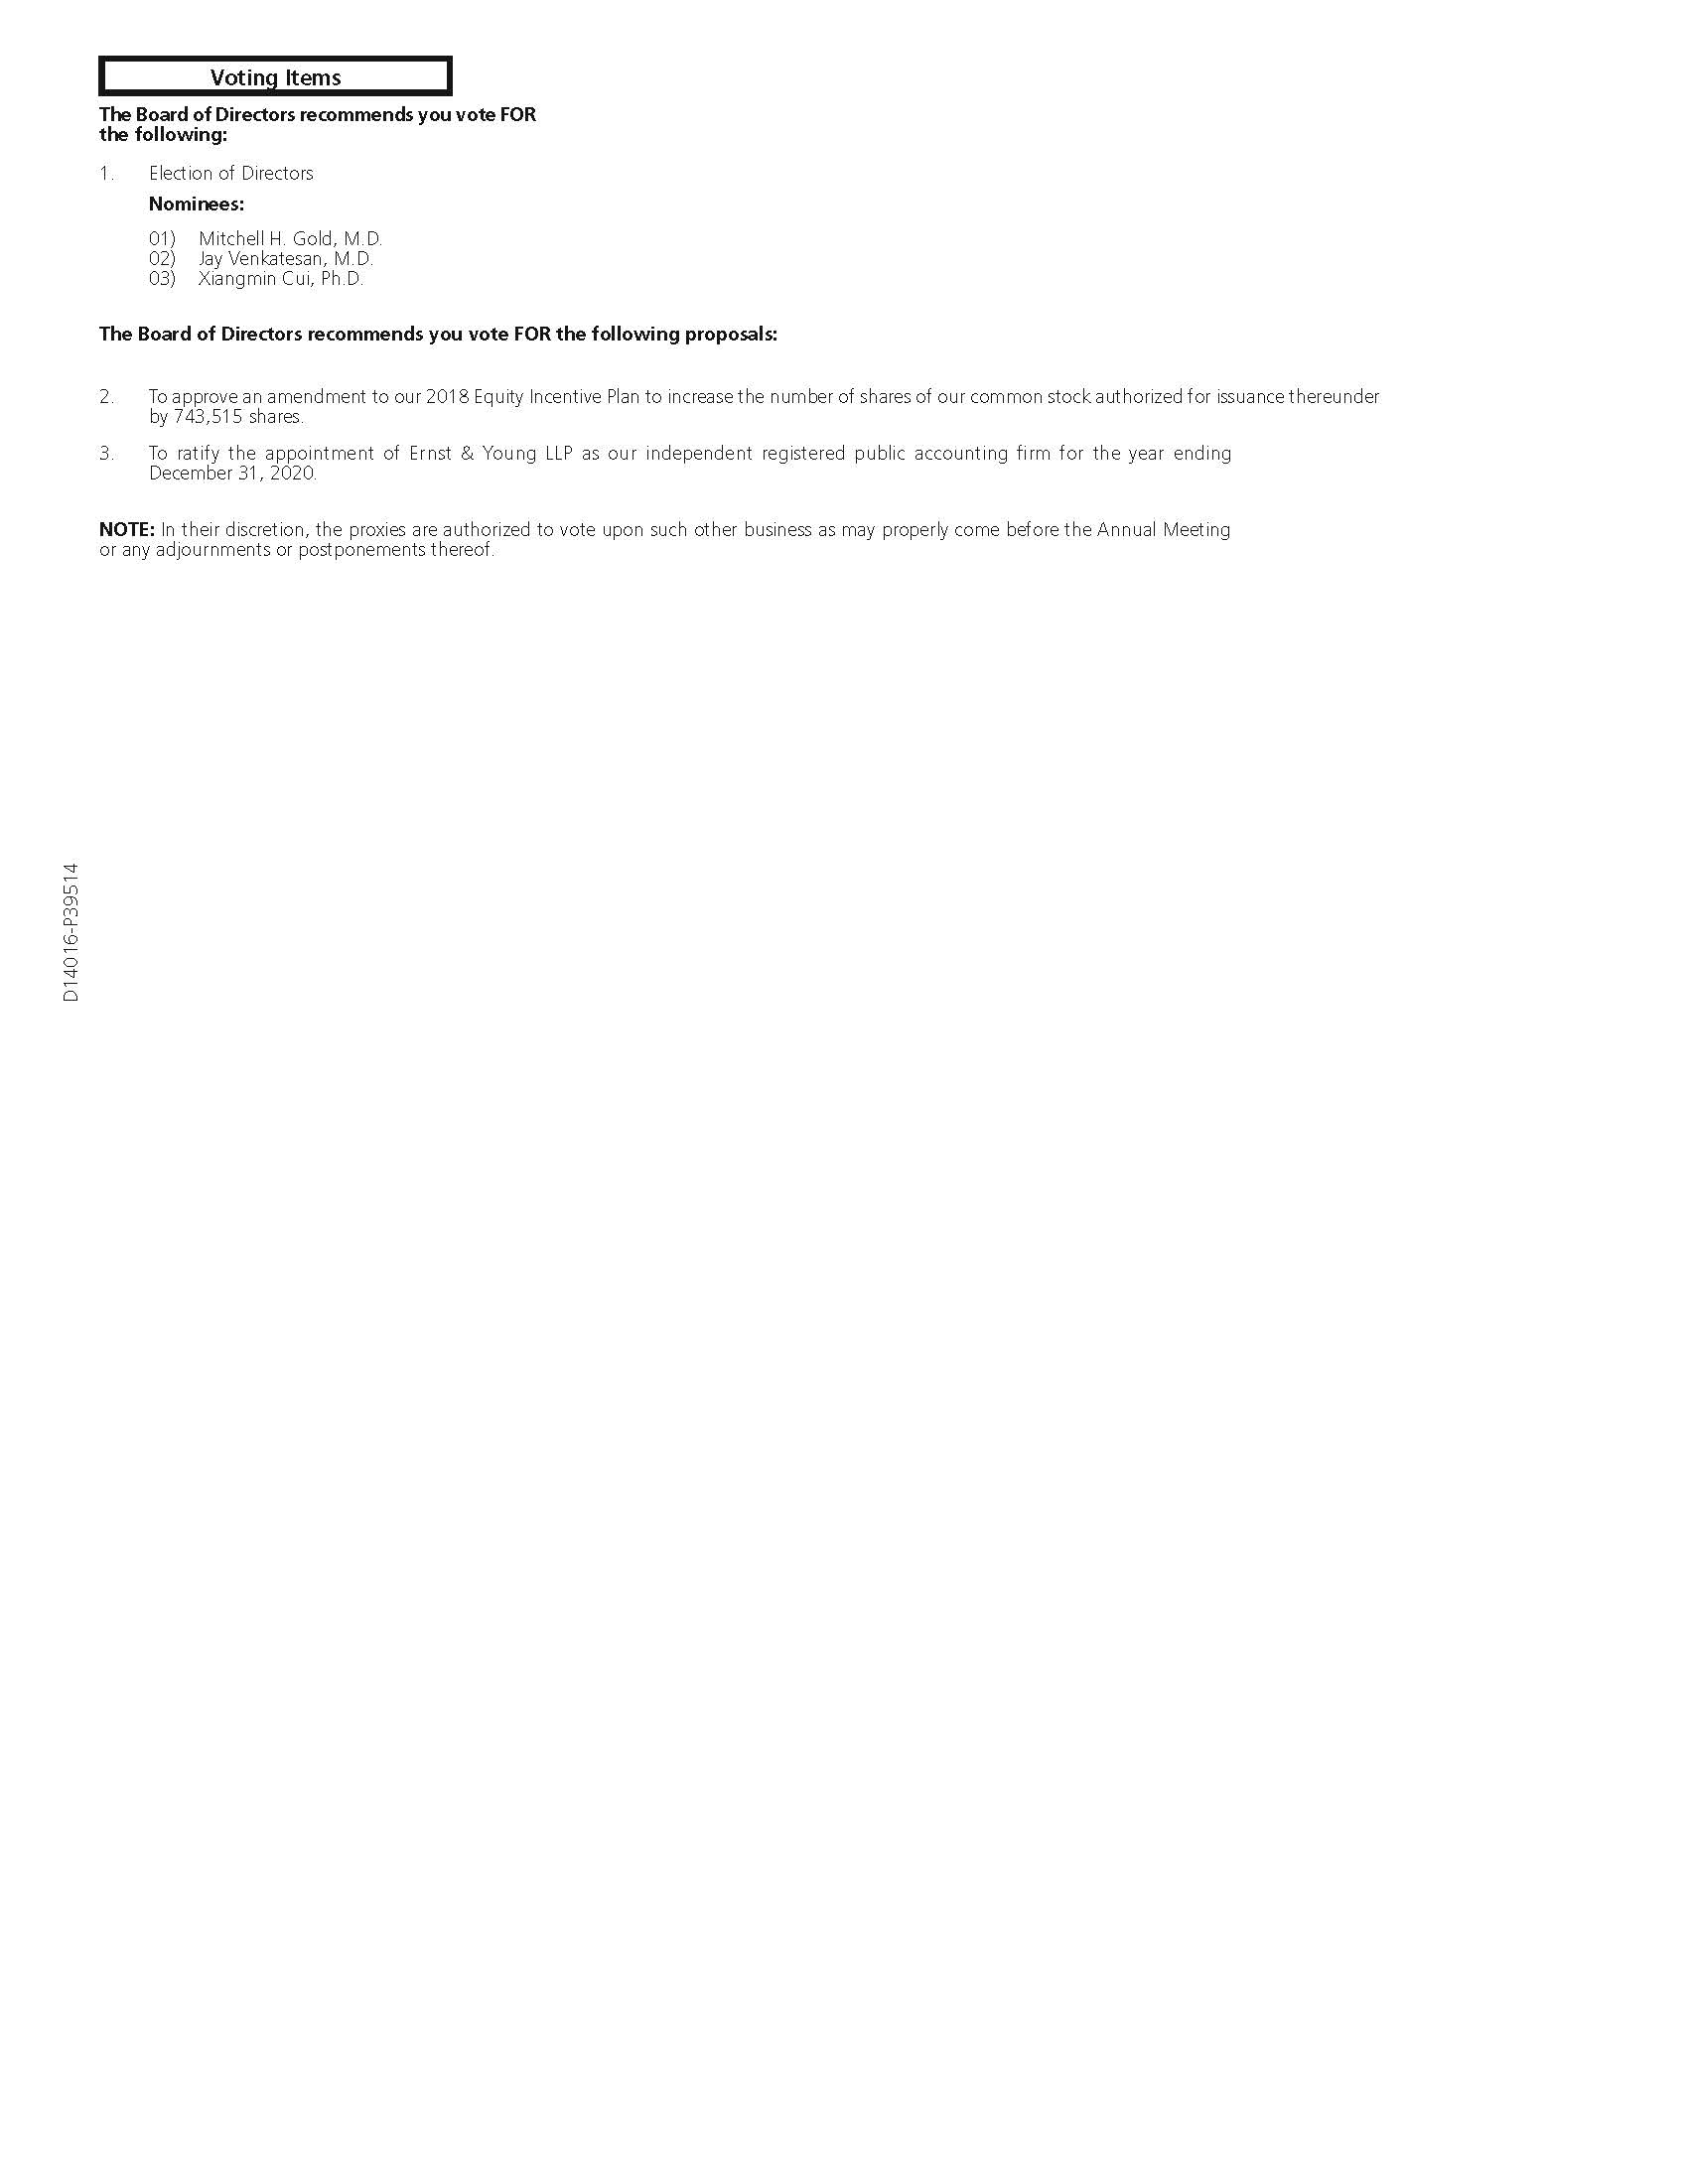 https://cdn.kscope.io/3e54d85ccbc8bc0998547f5af718375c-alpineimmunesciencesinc_na03.jpg